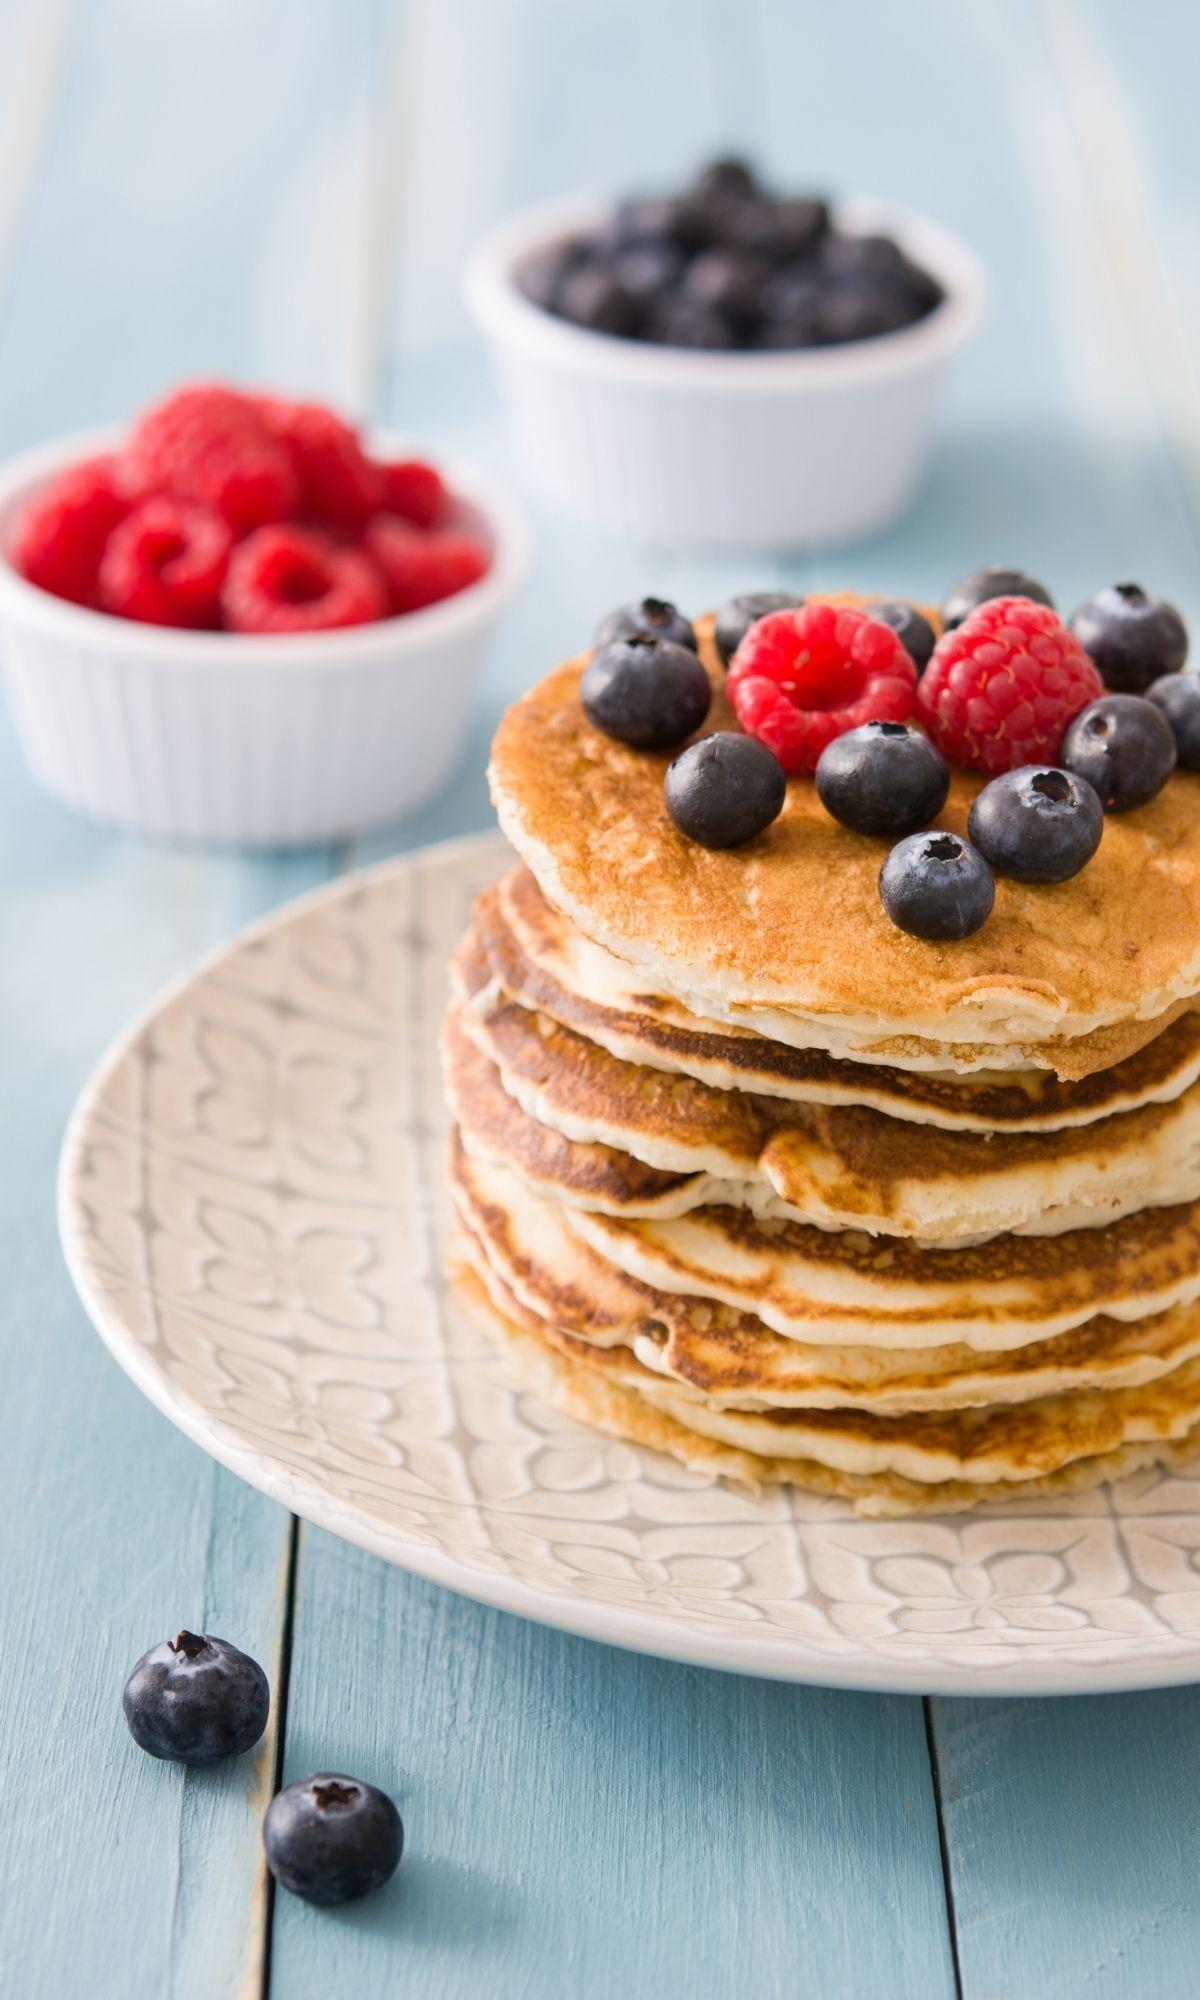 Pancakes with fresh fruit.